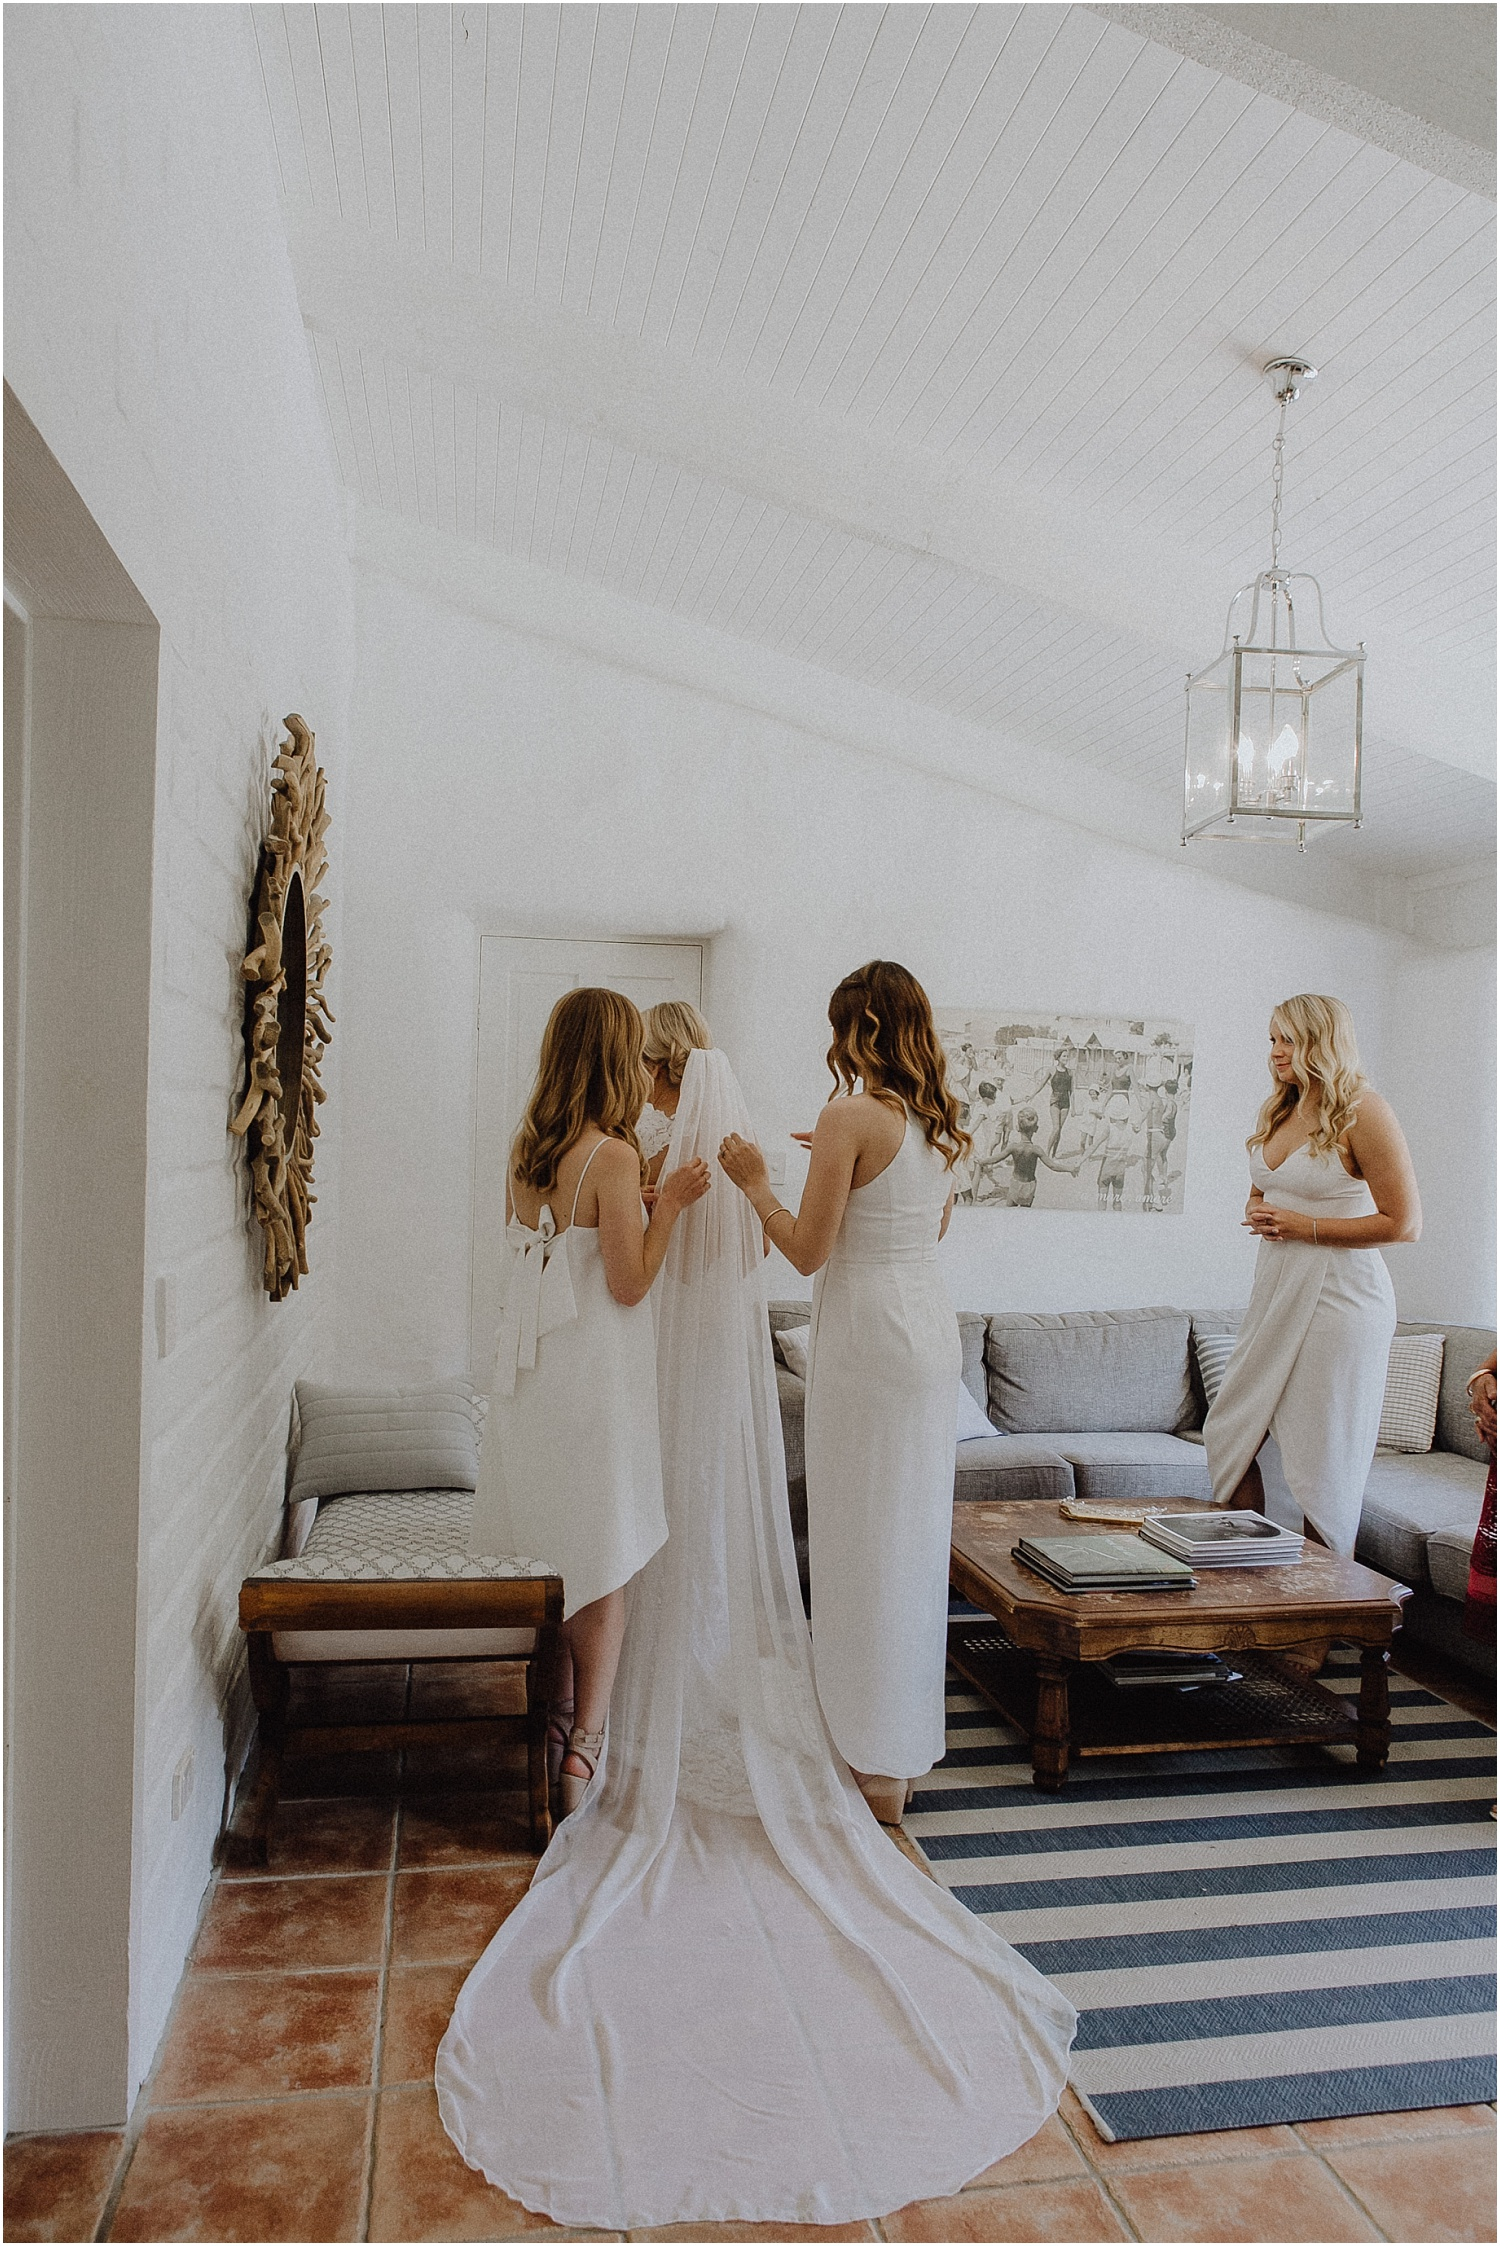 Nicolle and Damien's tipi wedding at the Flinders Yacht Club on the Mornington Peninsula._0051.jpg